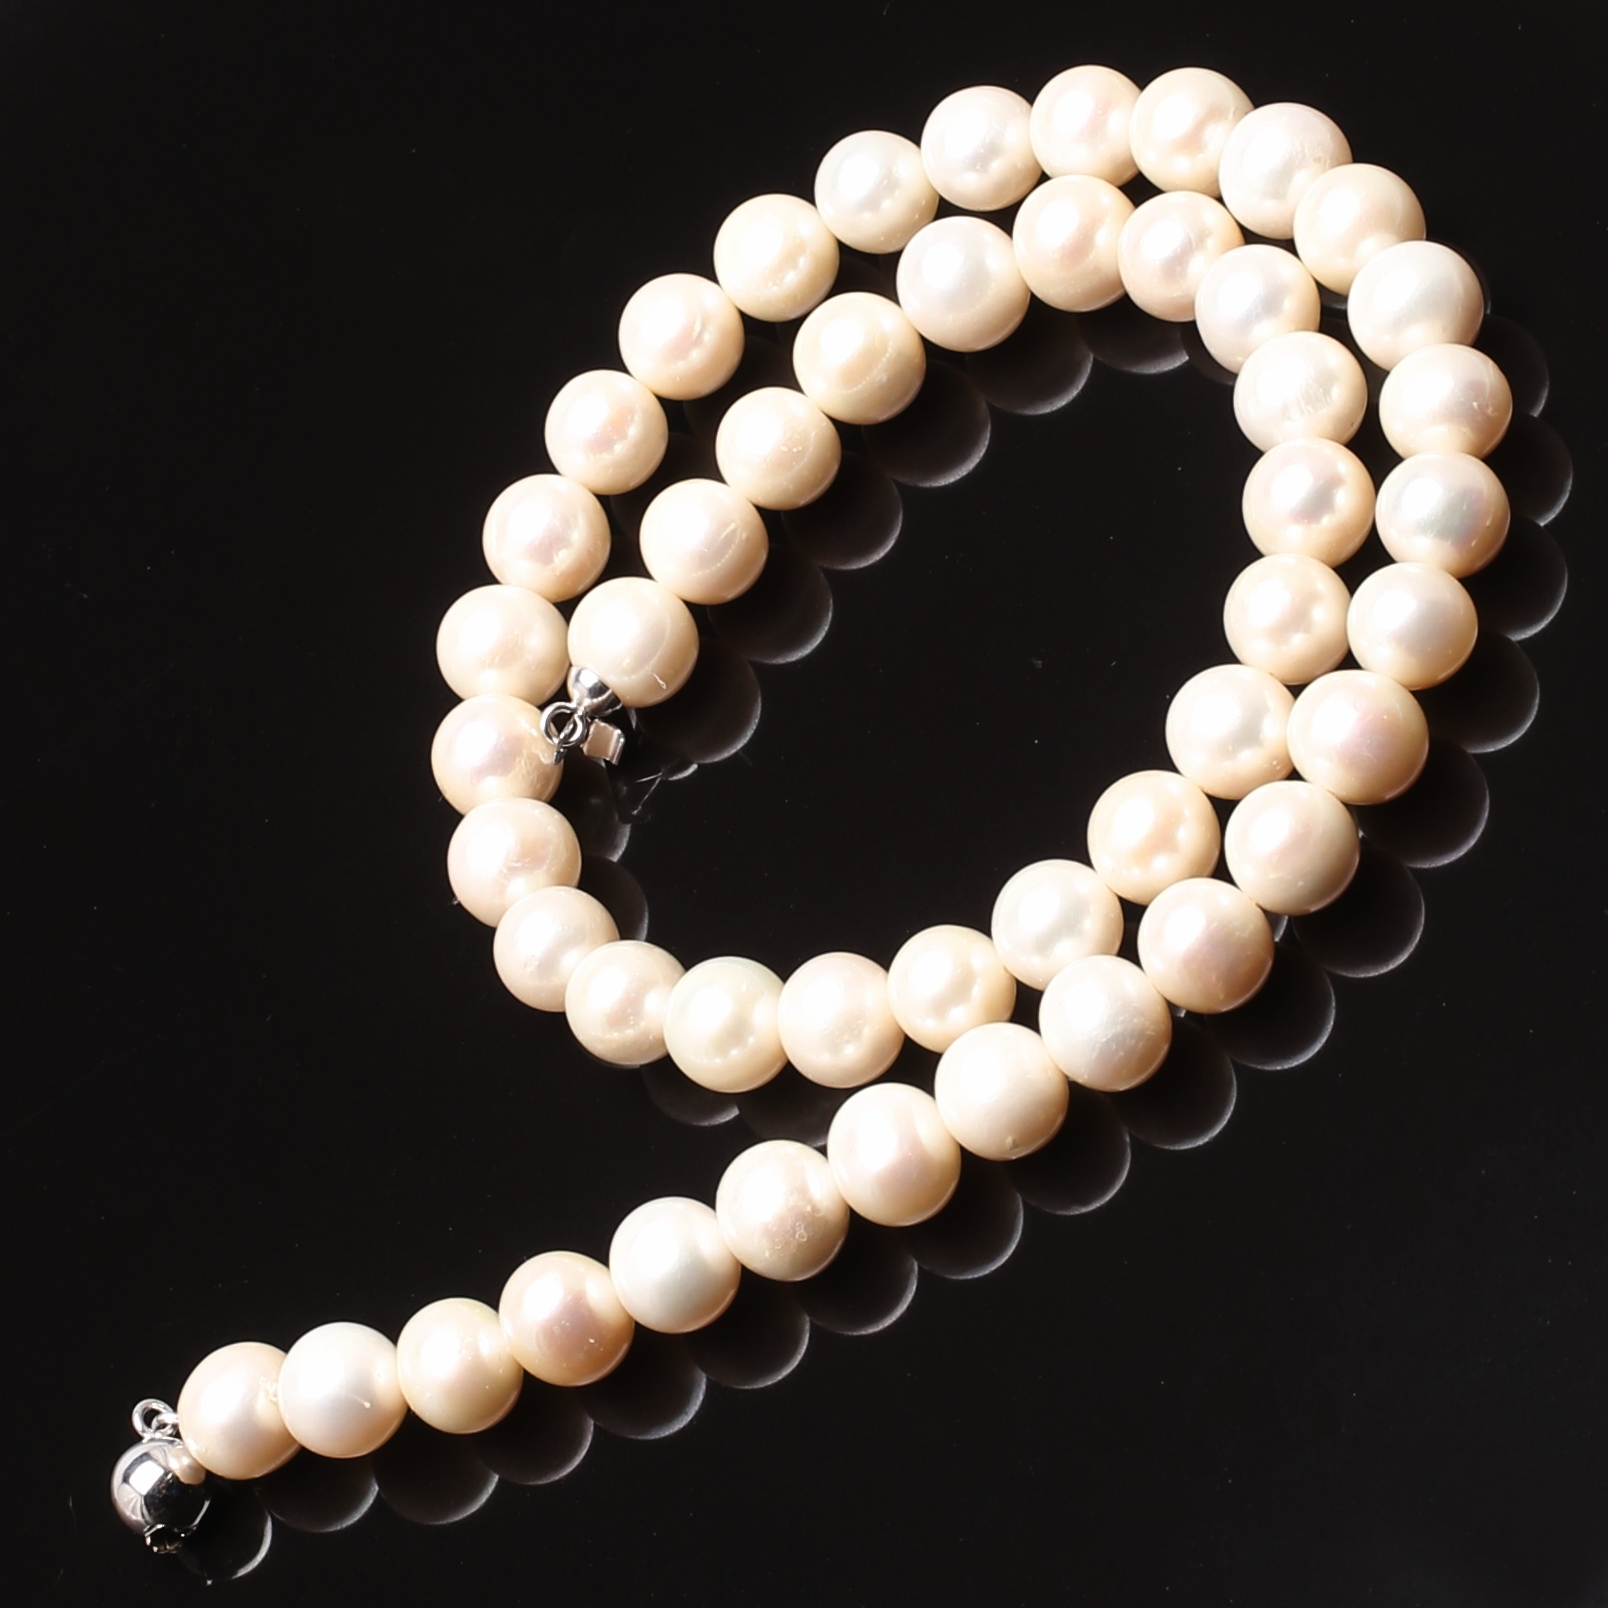 Halsband odlade pärlor med vitguldlås i 18K. Jewellery   Gemstones -  Necklace - Auctionet 6a1b8a3151391